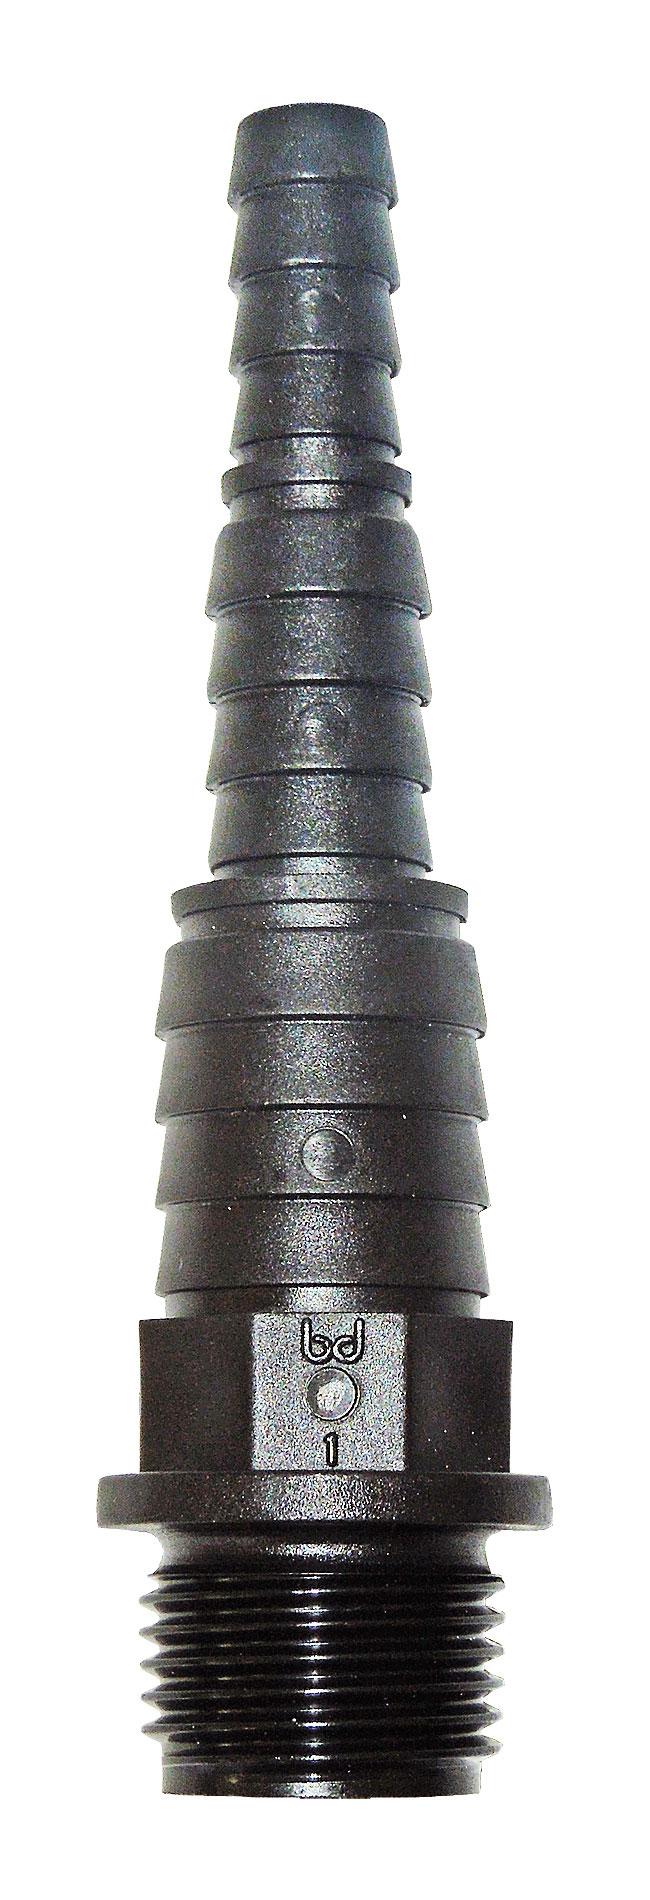 Filterpumpe Bachlaufpumpe Heissner Aqua Craft ECO P 4100E-00 Bild 2